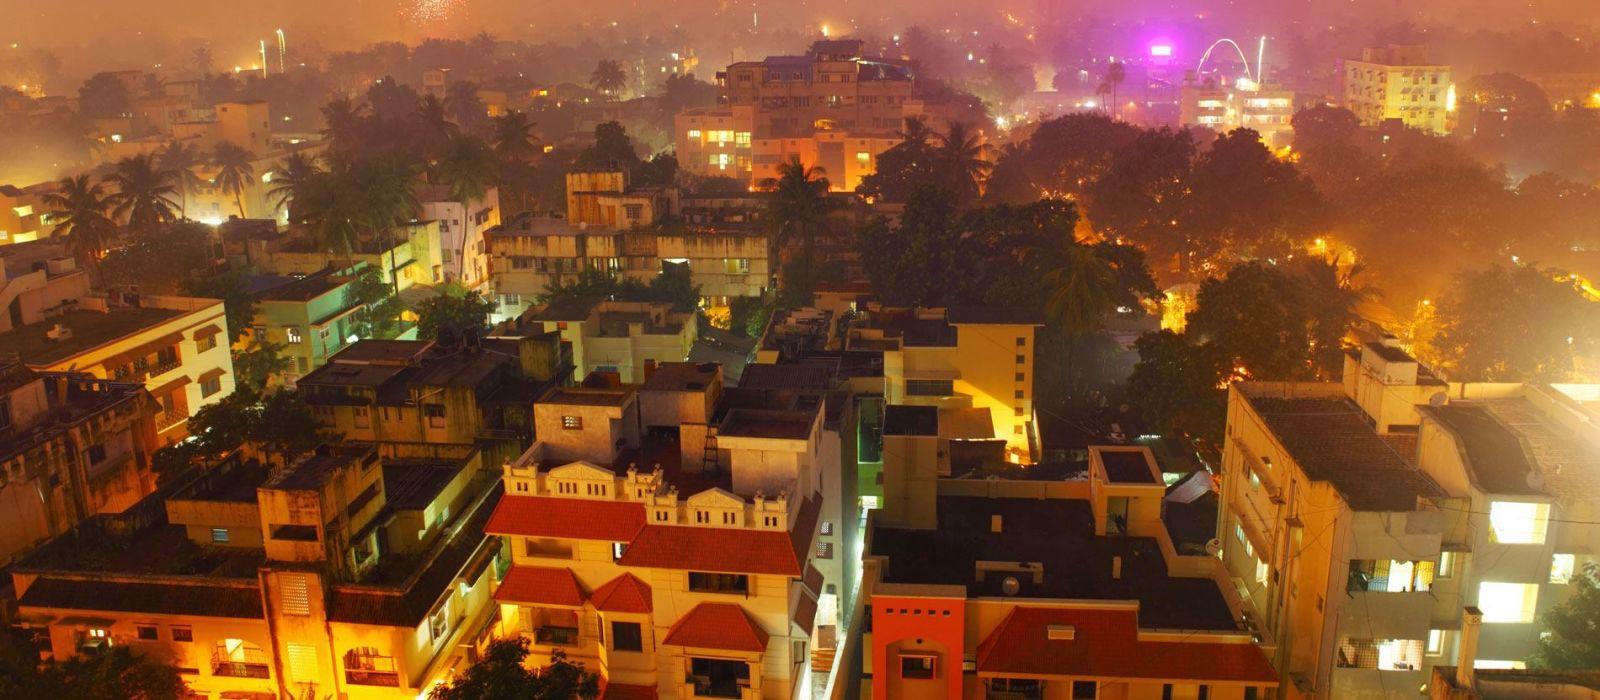 Destination Chennai South India